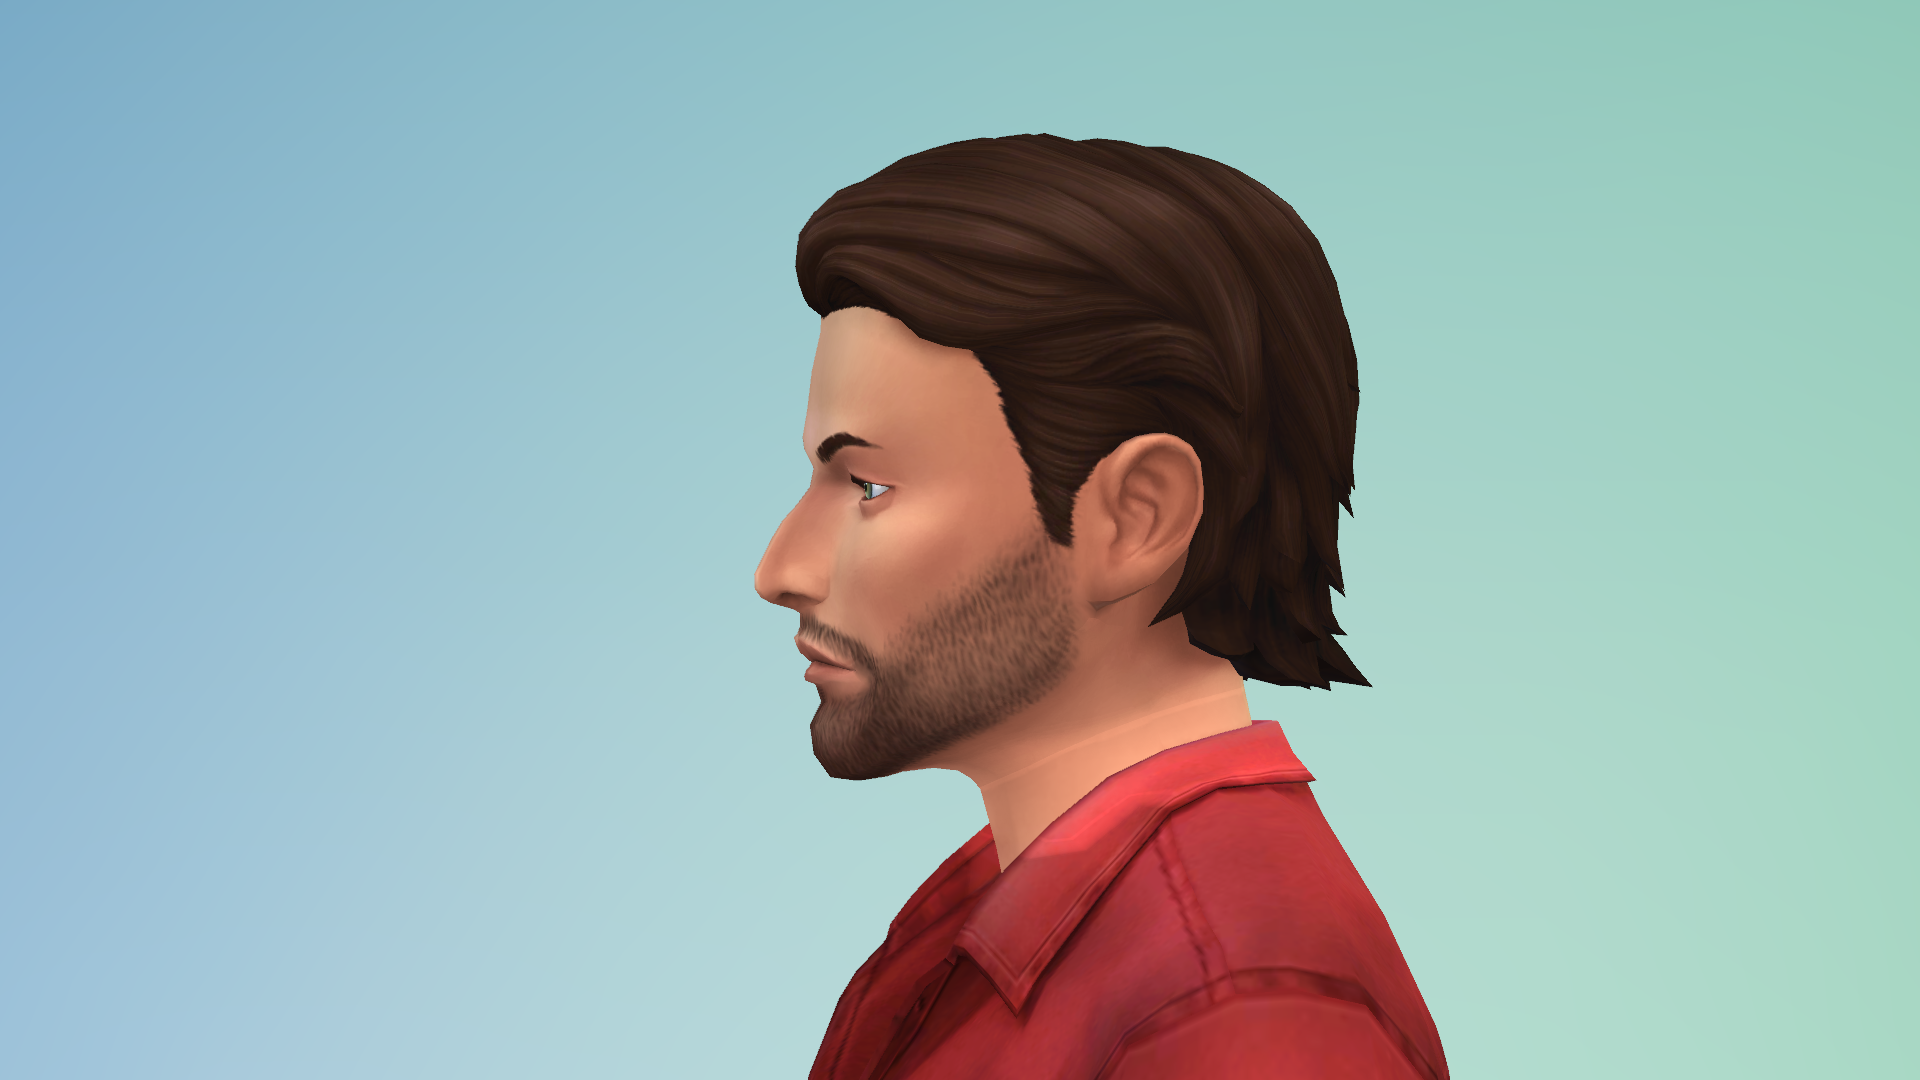 Симы и стили от Amcat.- Страница 11 — Форум The Sims